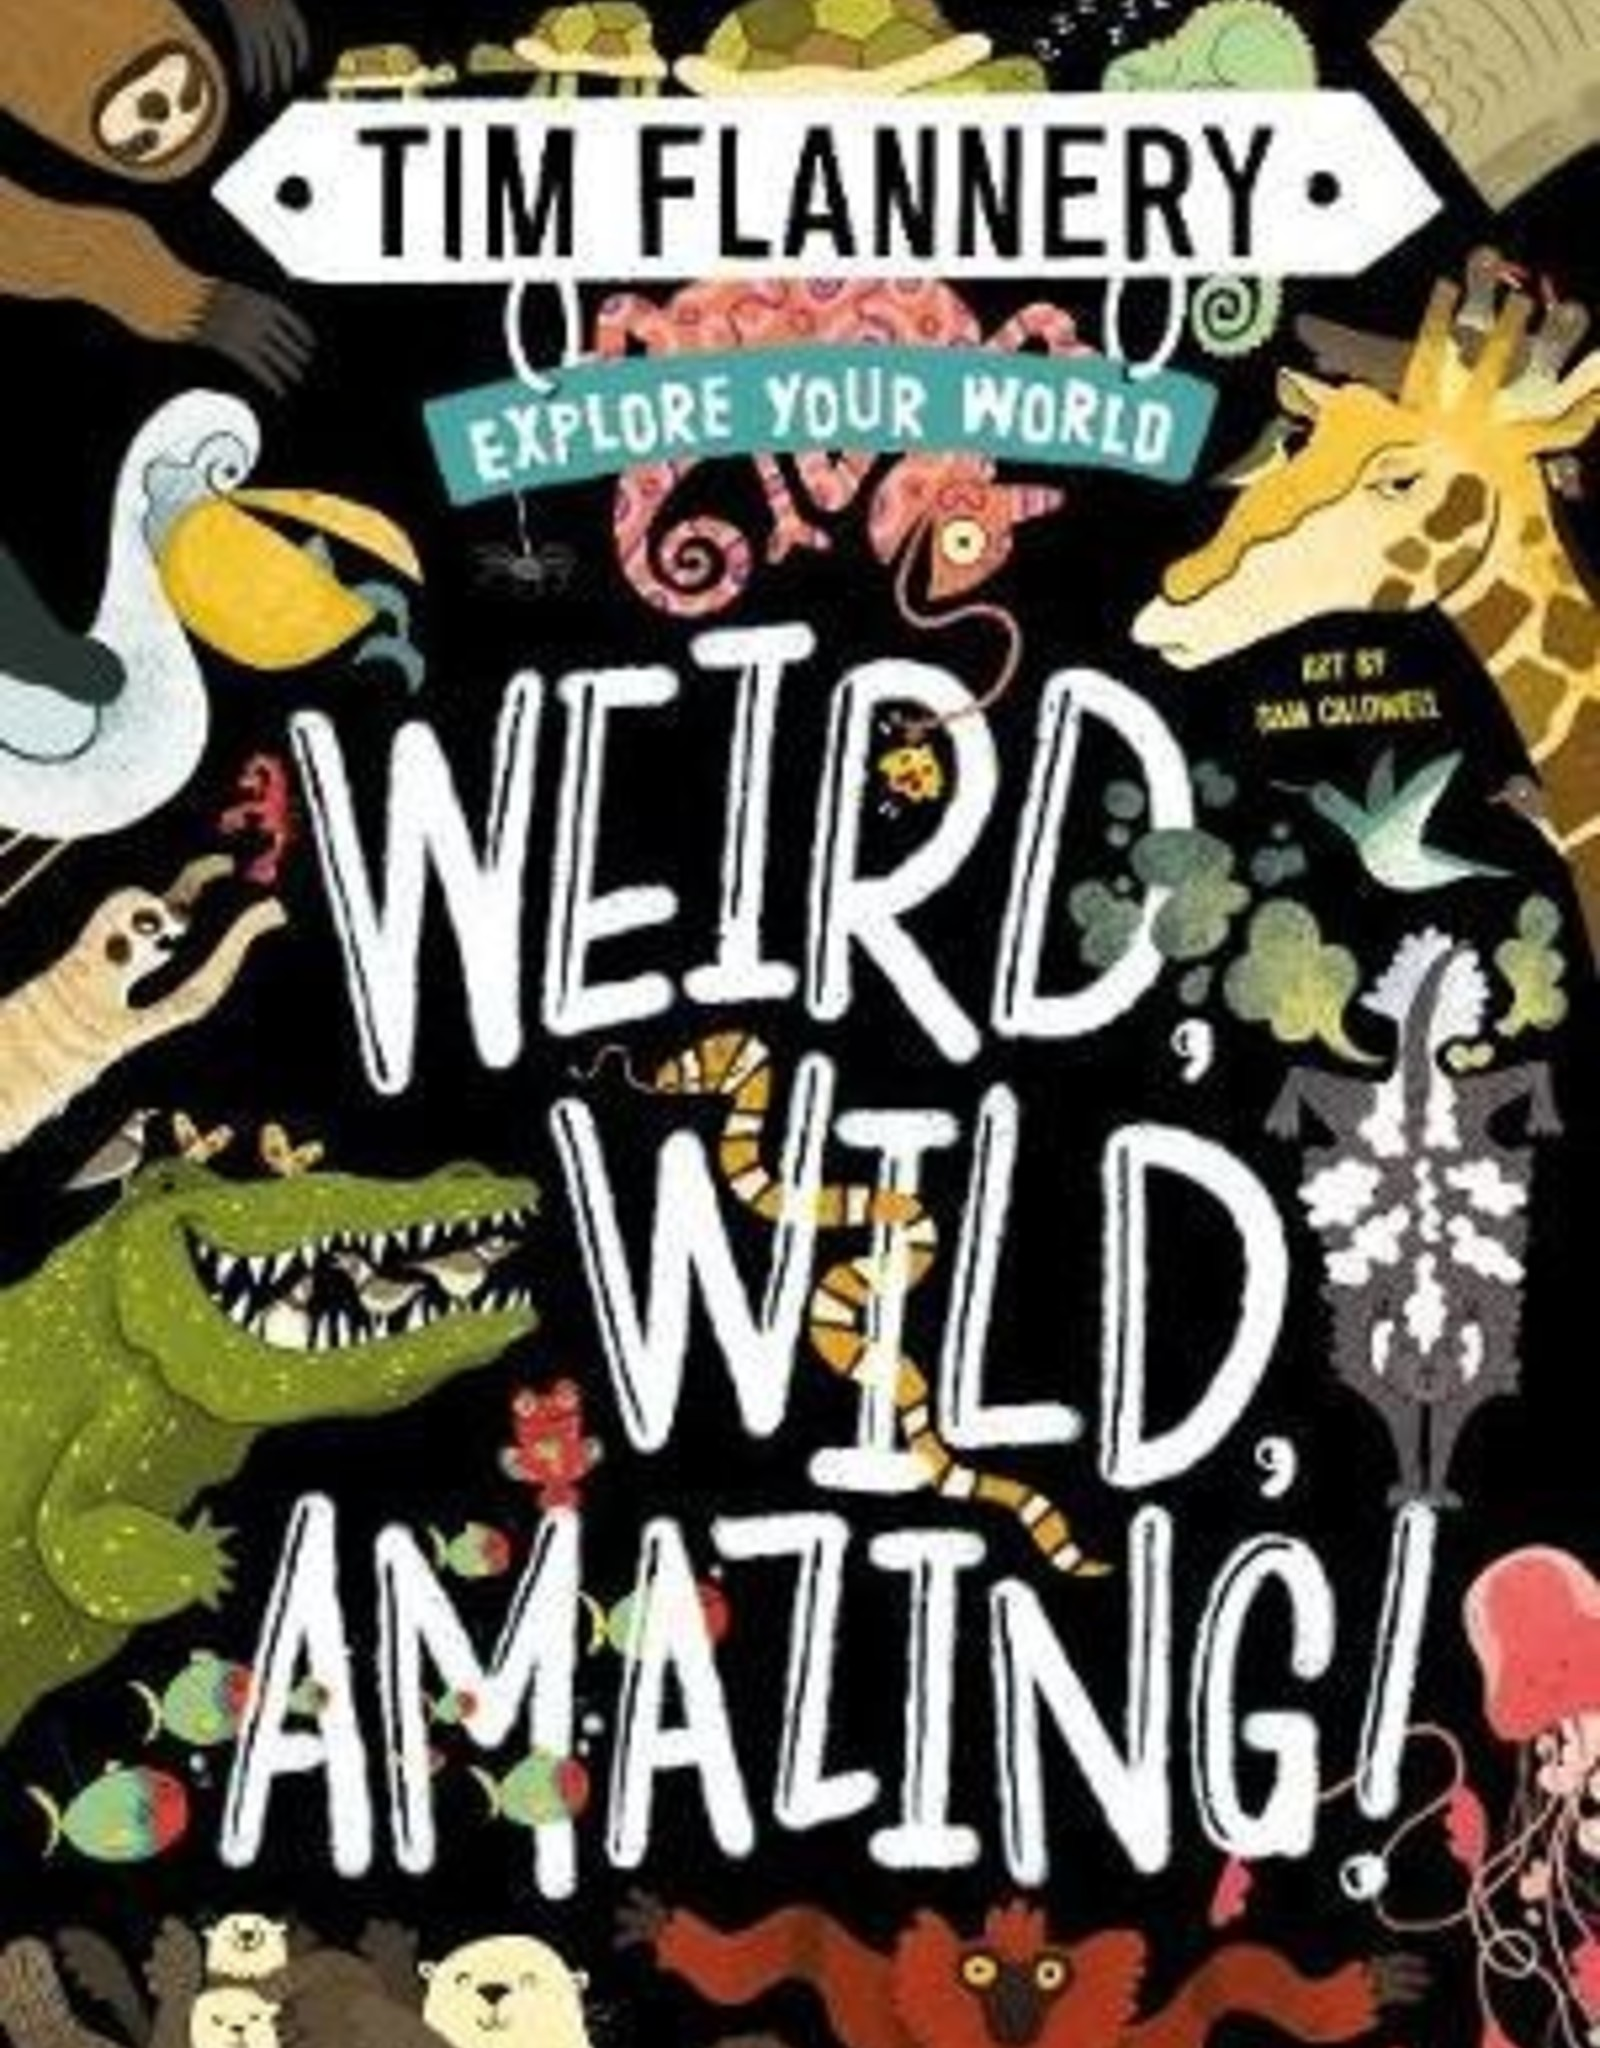 Explore Your World: Weird, Wild, Amazing - Tim Flannery